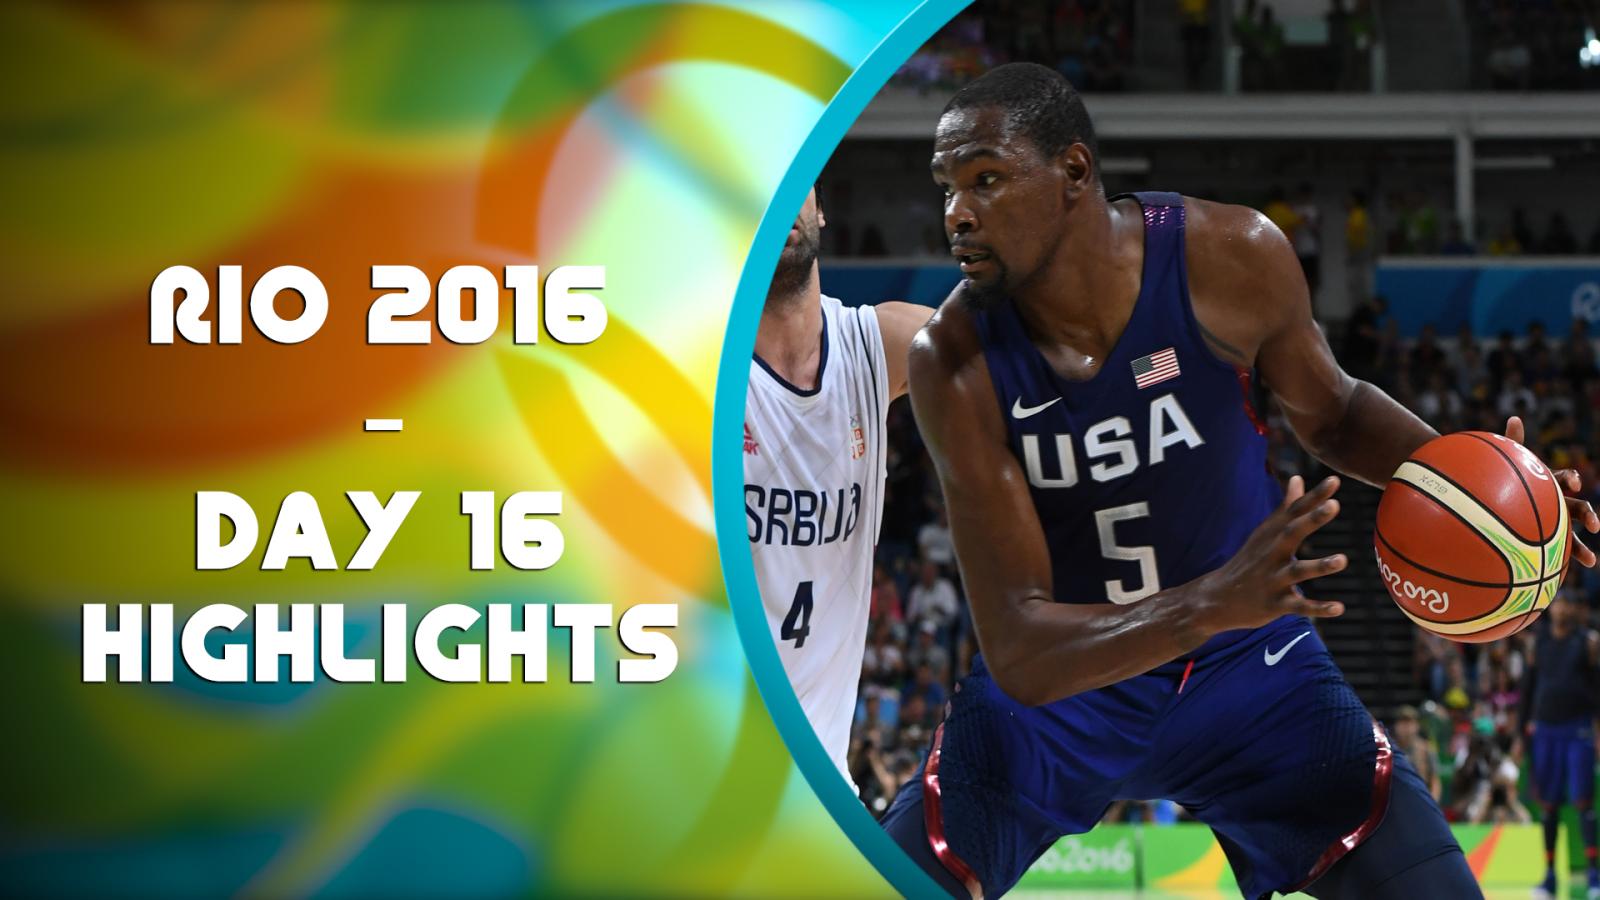 Rio 2016 Olympics: Day 16 highlights